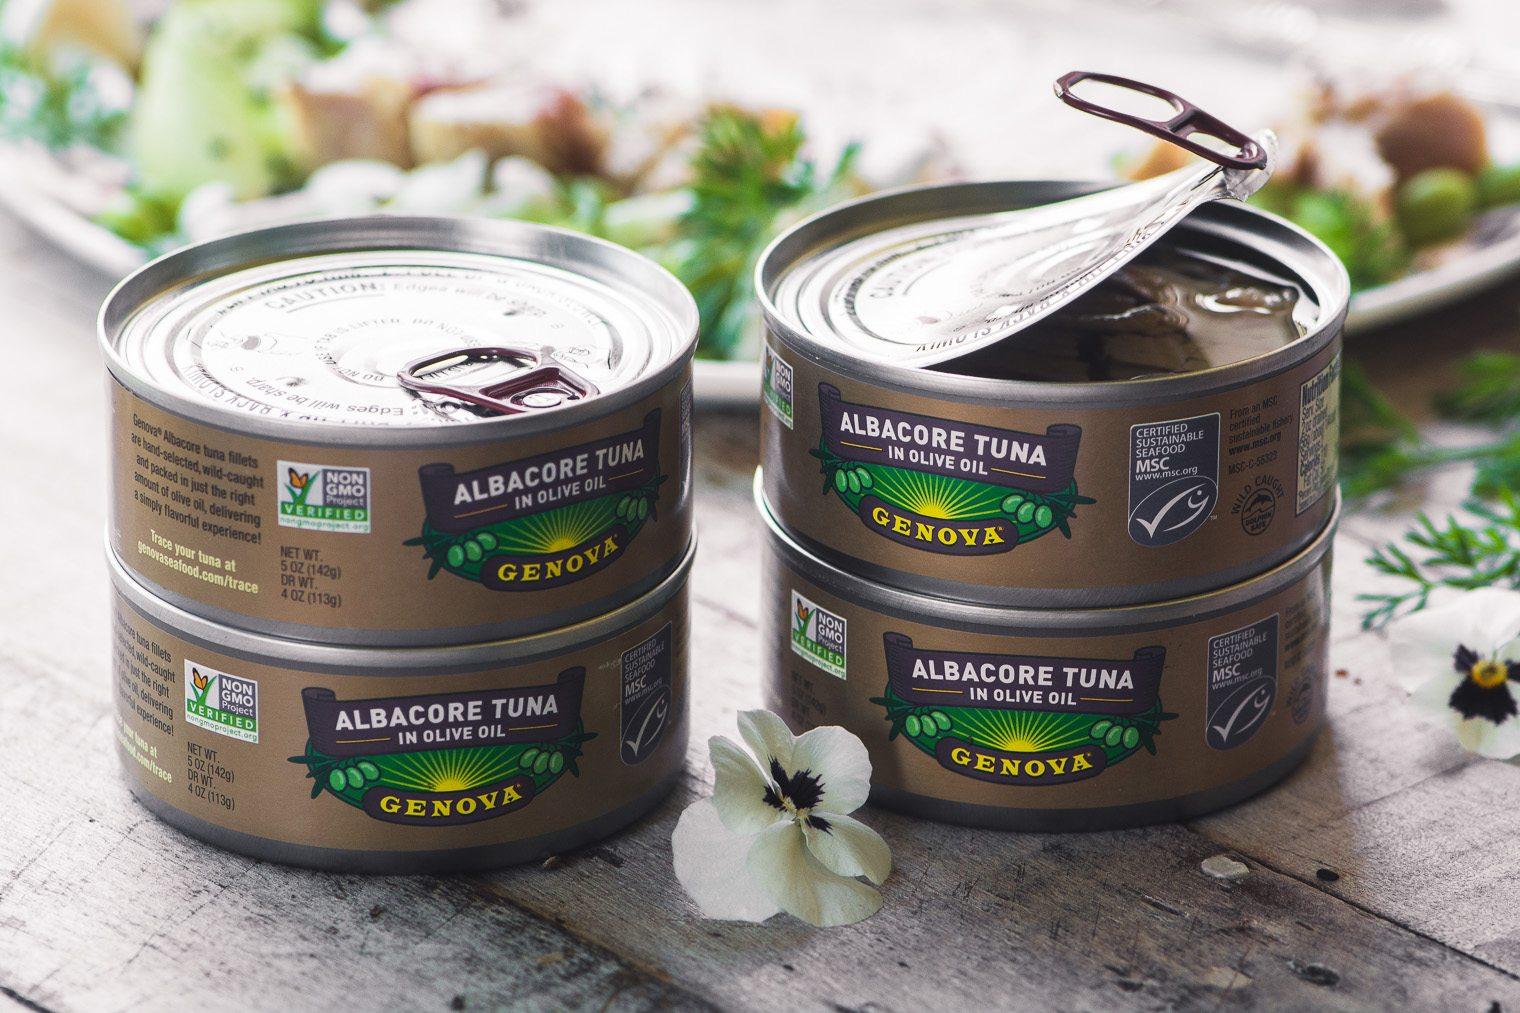 cans of Genova Tuna